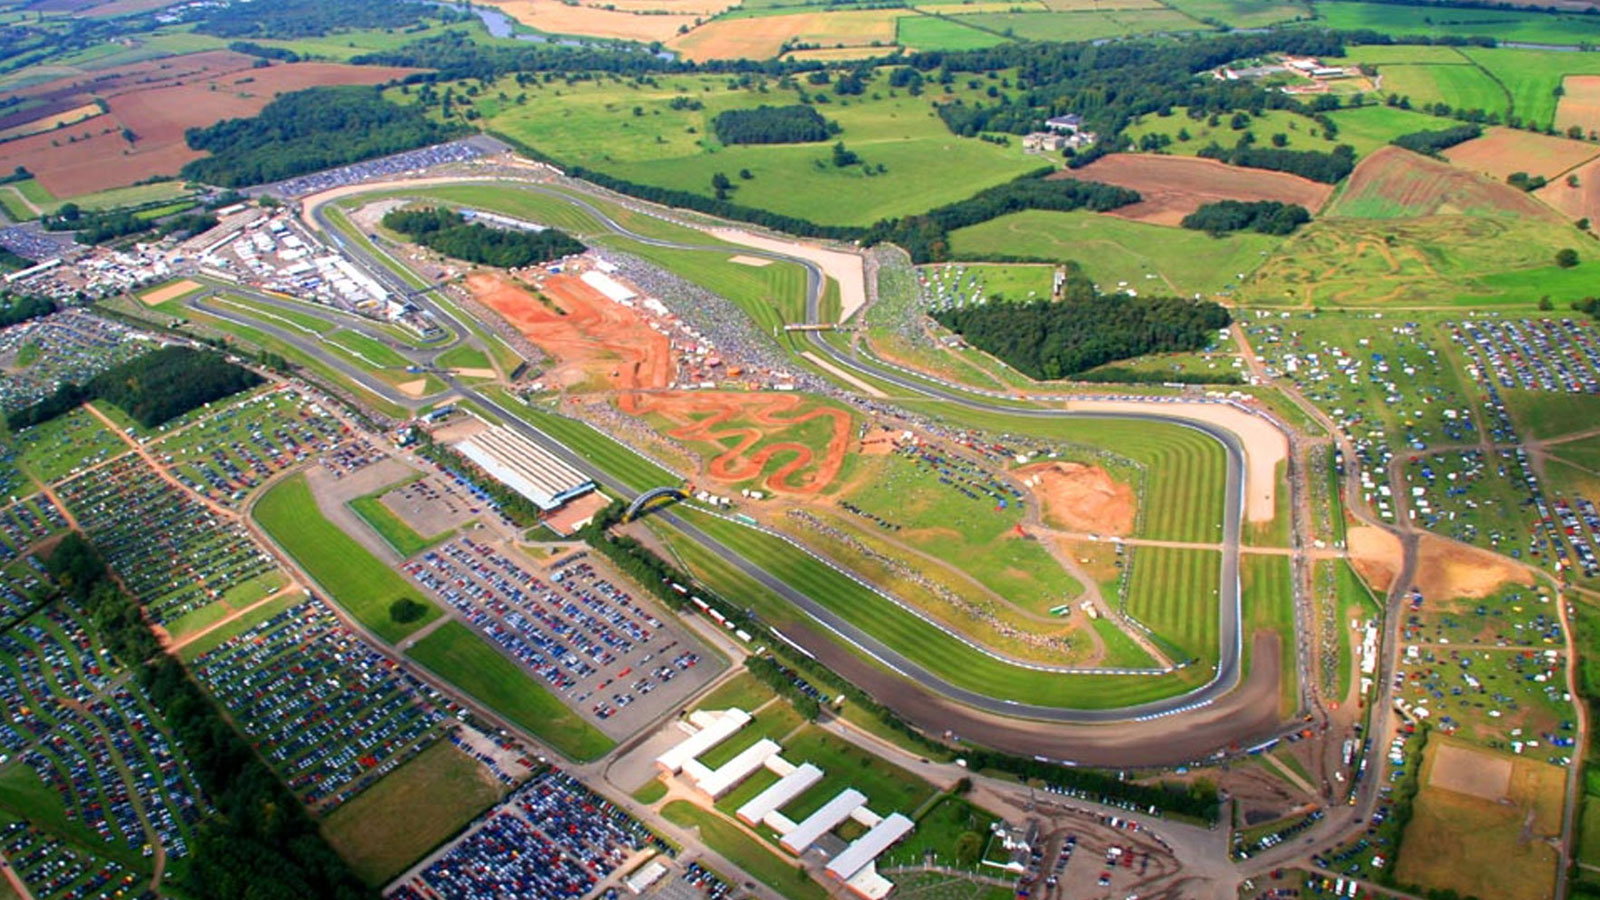 Donington, England - Second Race 22 - 23 June 2019, Donington, EnglandBritish GT Championship> Read Race Report